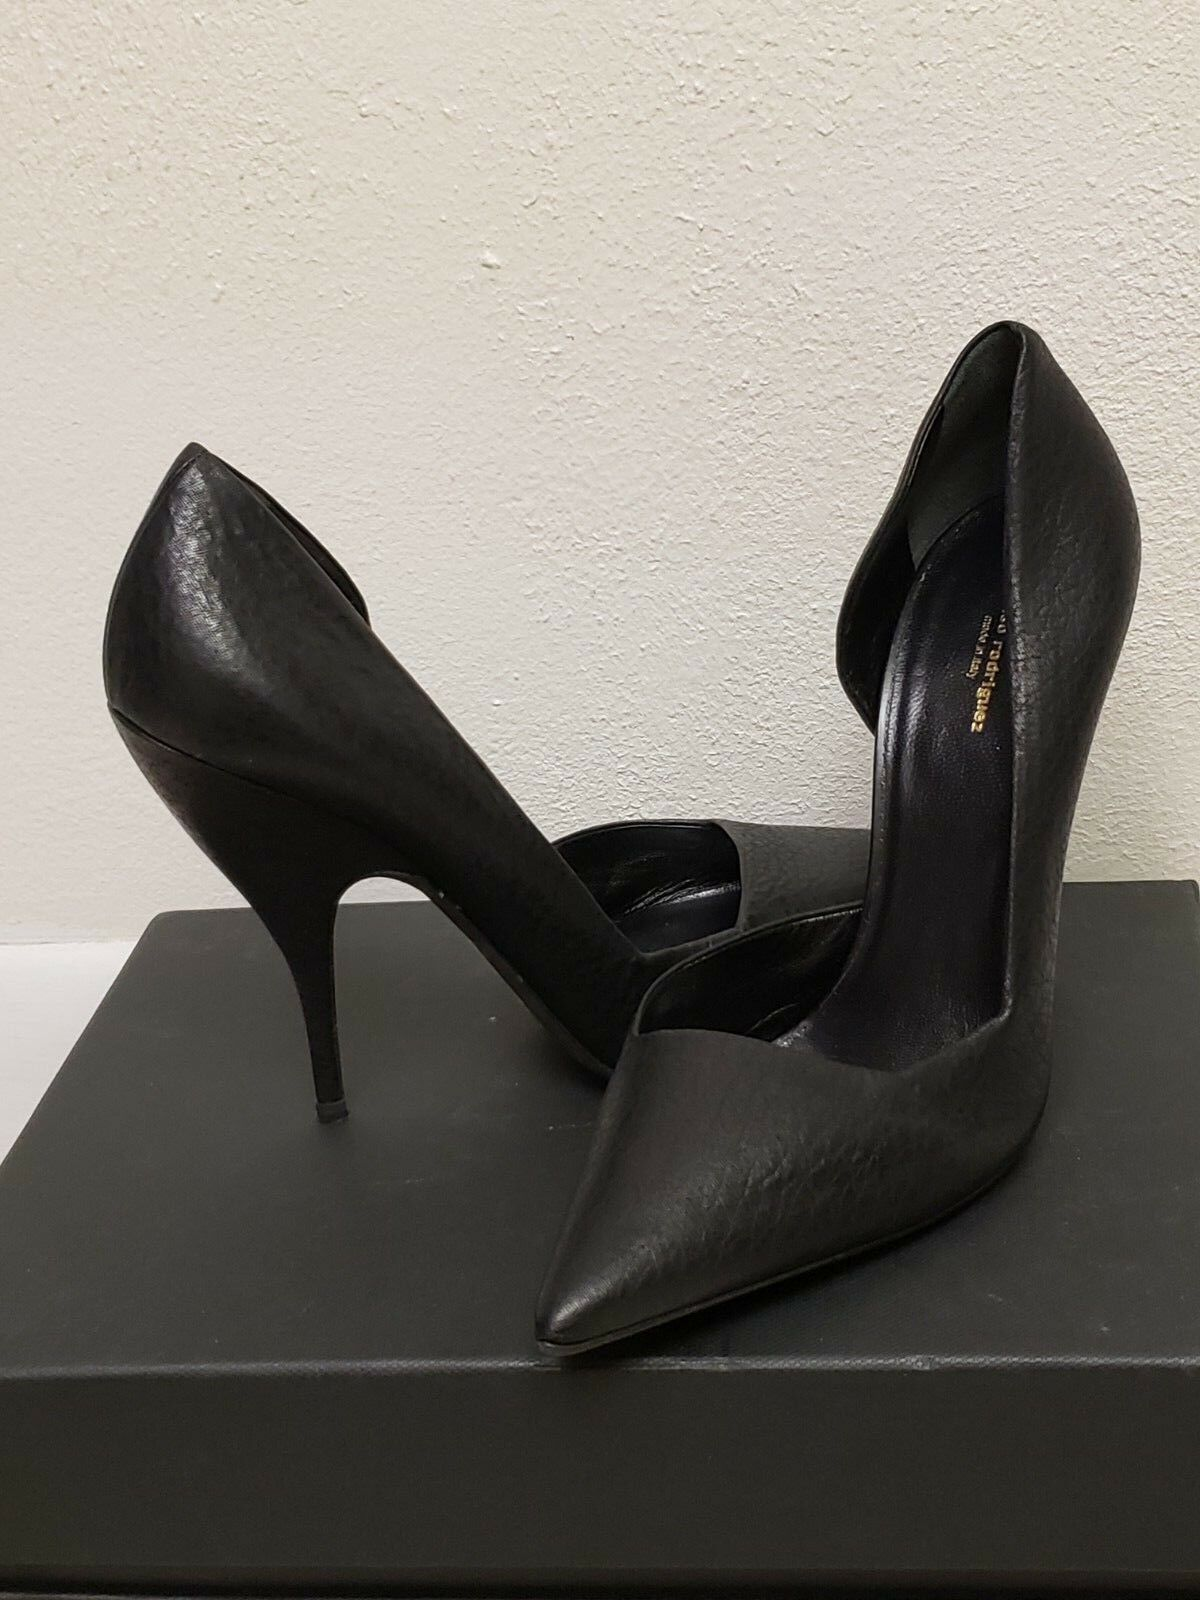 Narciso Rodriguez Zehen Zeigen Pumps Schuhe Schwarz Asymmetrisch Euc Sz 39.5